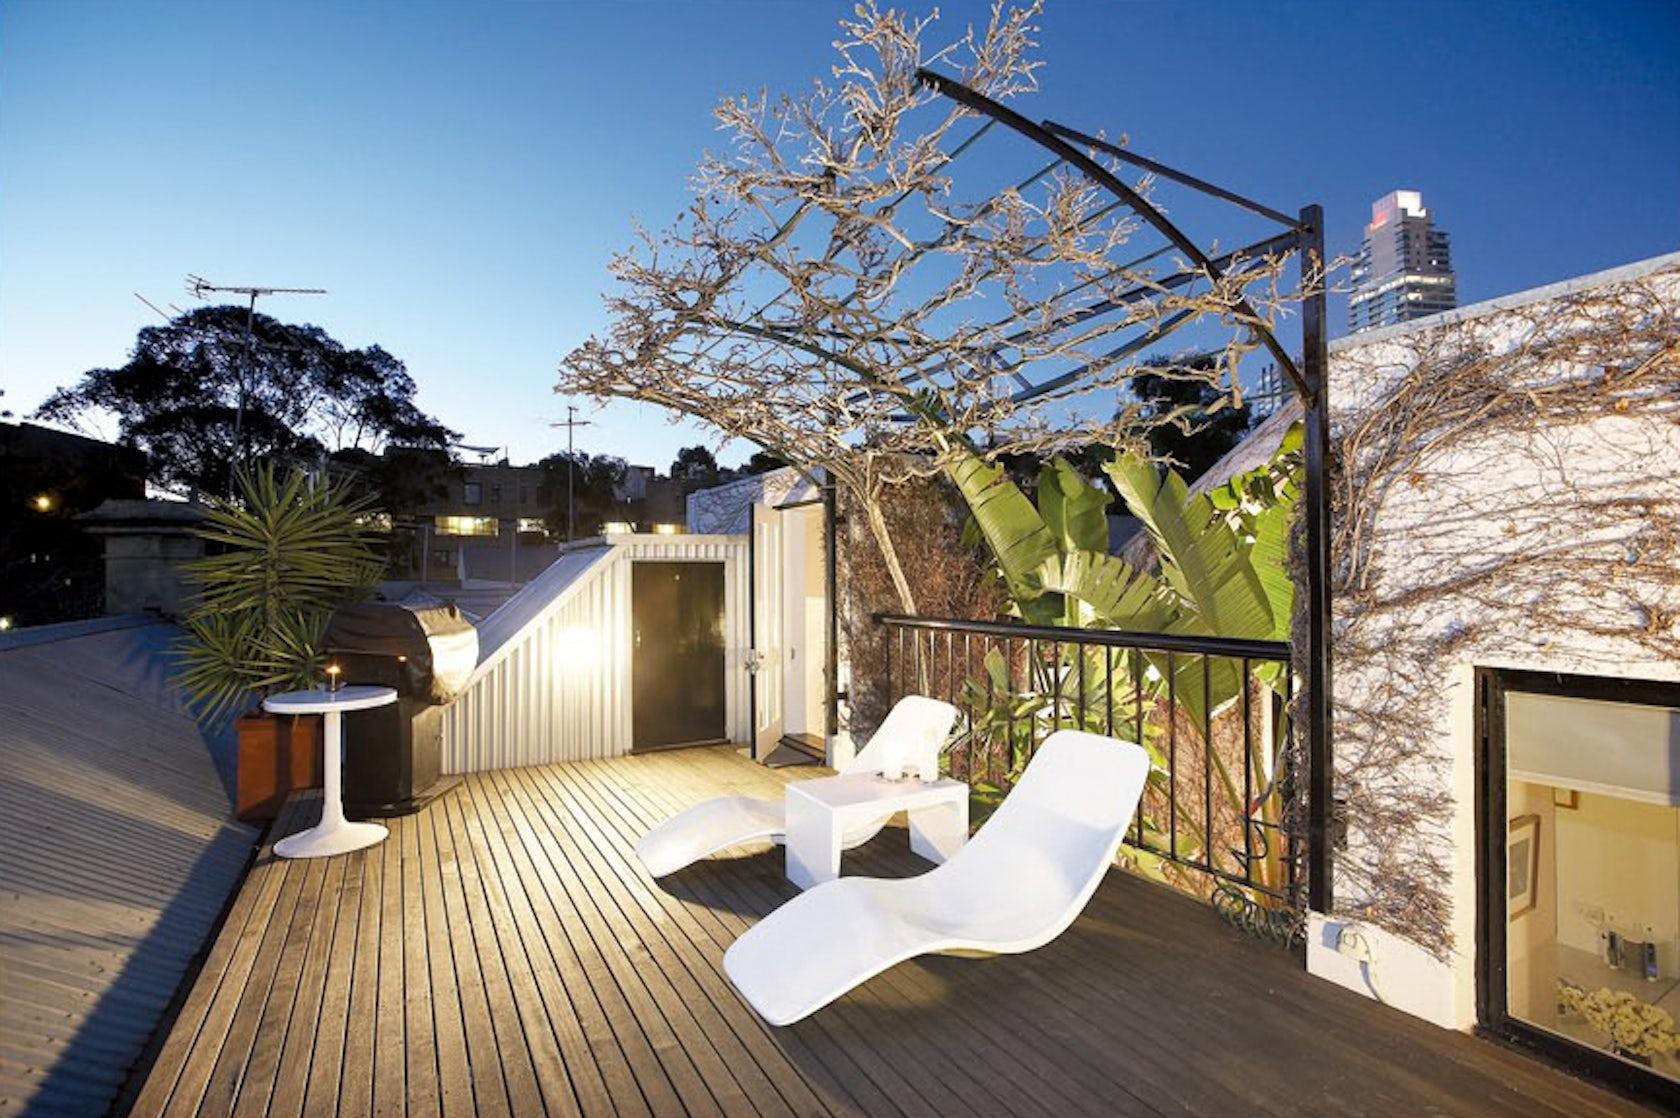 Bruce allen architect pty ltd architizer for Architecture design studio pty ltd